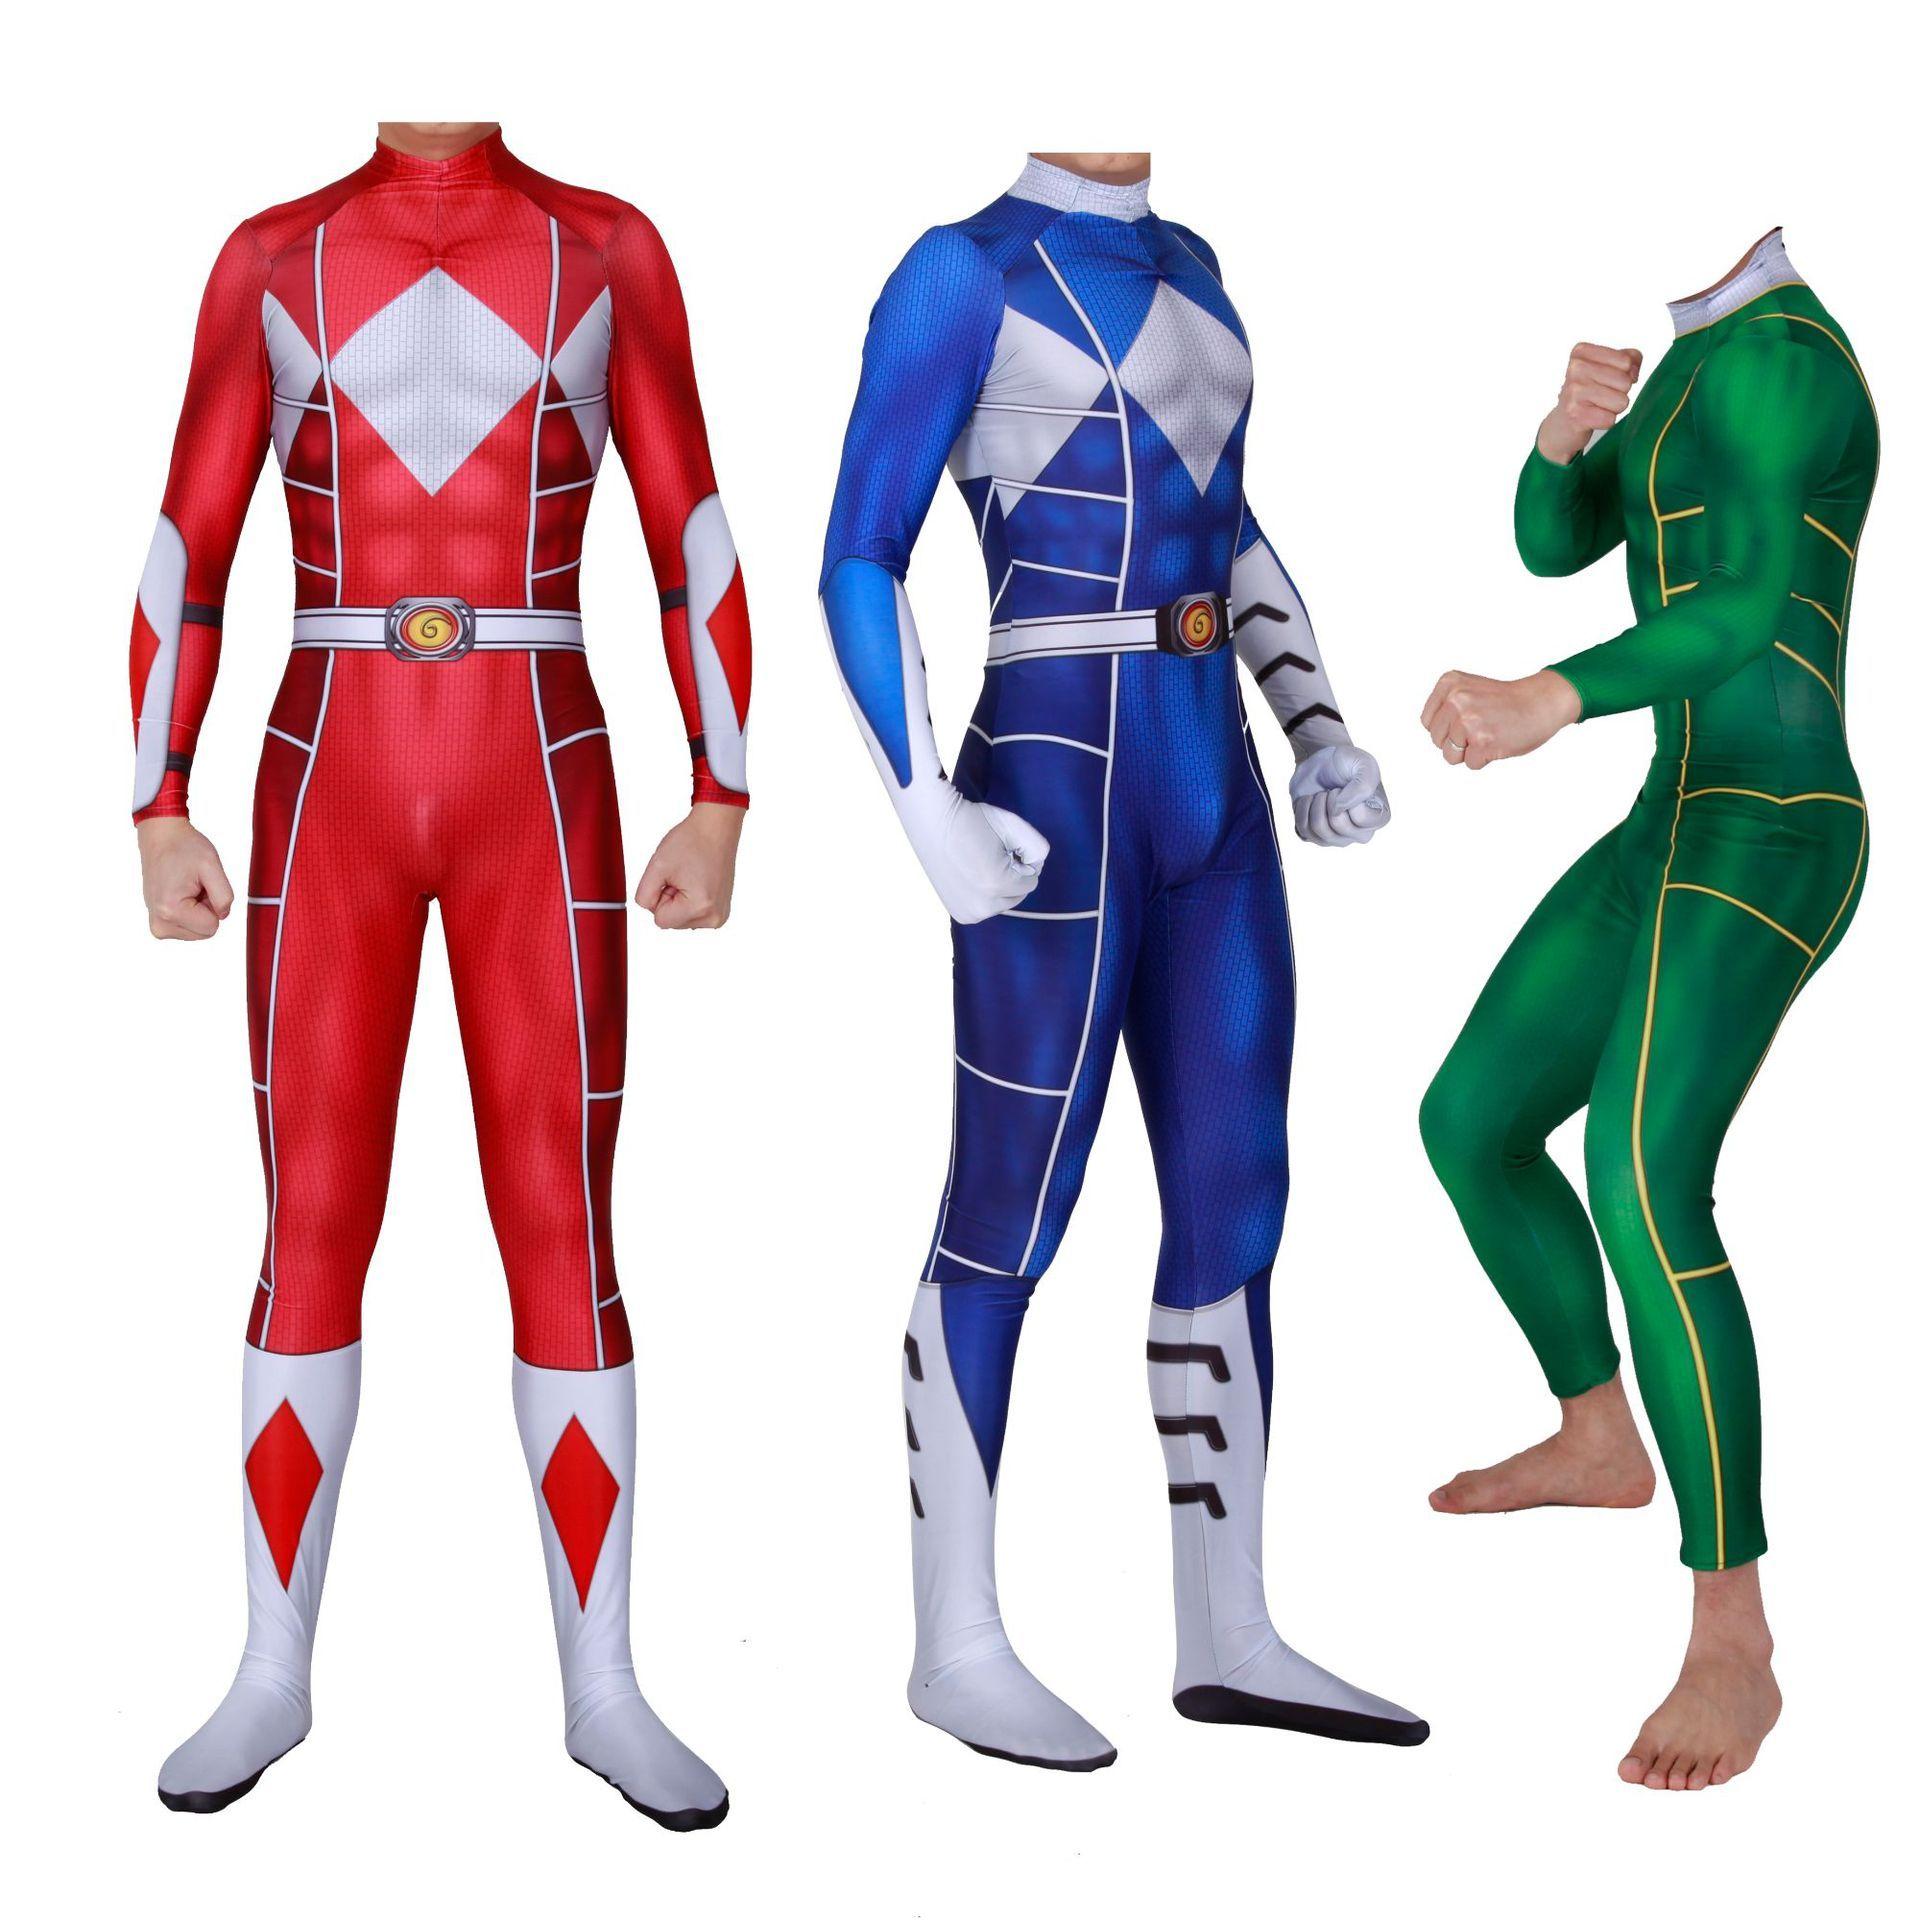 3D Print Kyoryu Sentai Zyuranger Ranger Cosplay Costume Red/Blue/Green  Rangers Bodysuit Cheap Zentai Suit Womens Halloween Costume Haloween  Costume